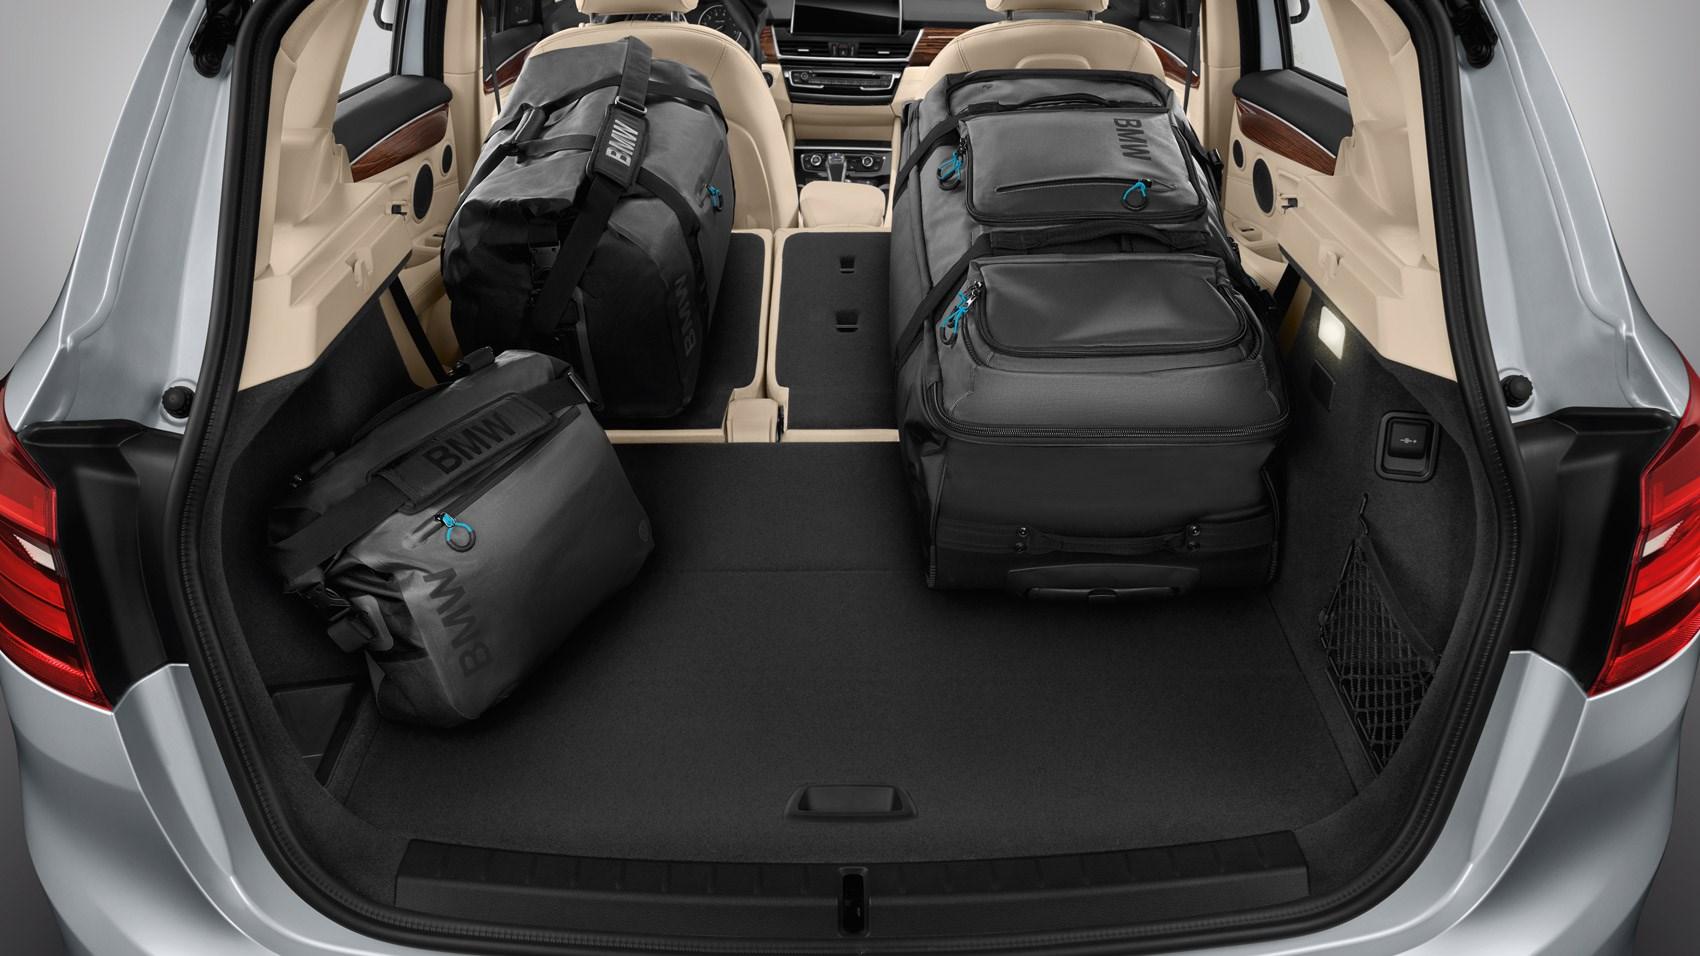 Bmw 2 Series Active Tourer 225xe 2016 Review Car Magazine